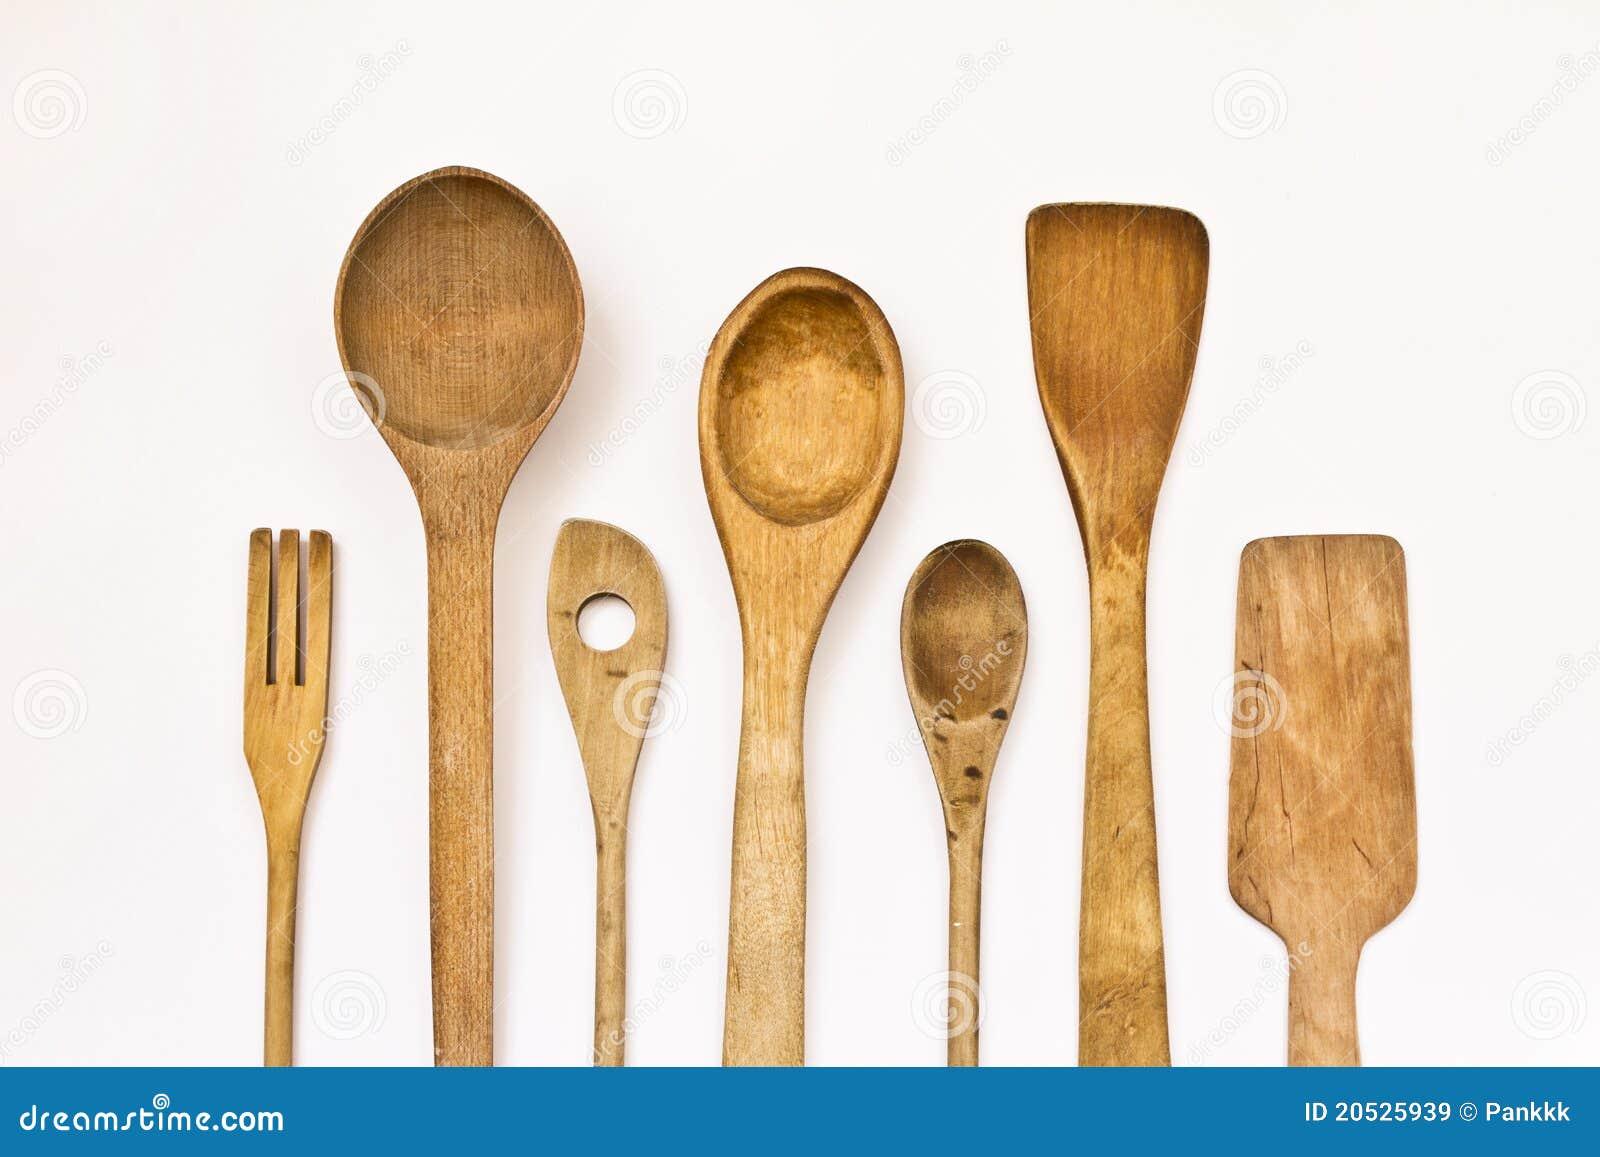 Kitchen wooden utensils royalty free stock images image for Wooden kitchen utensils